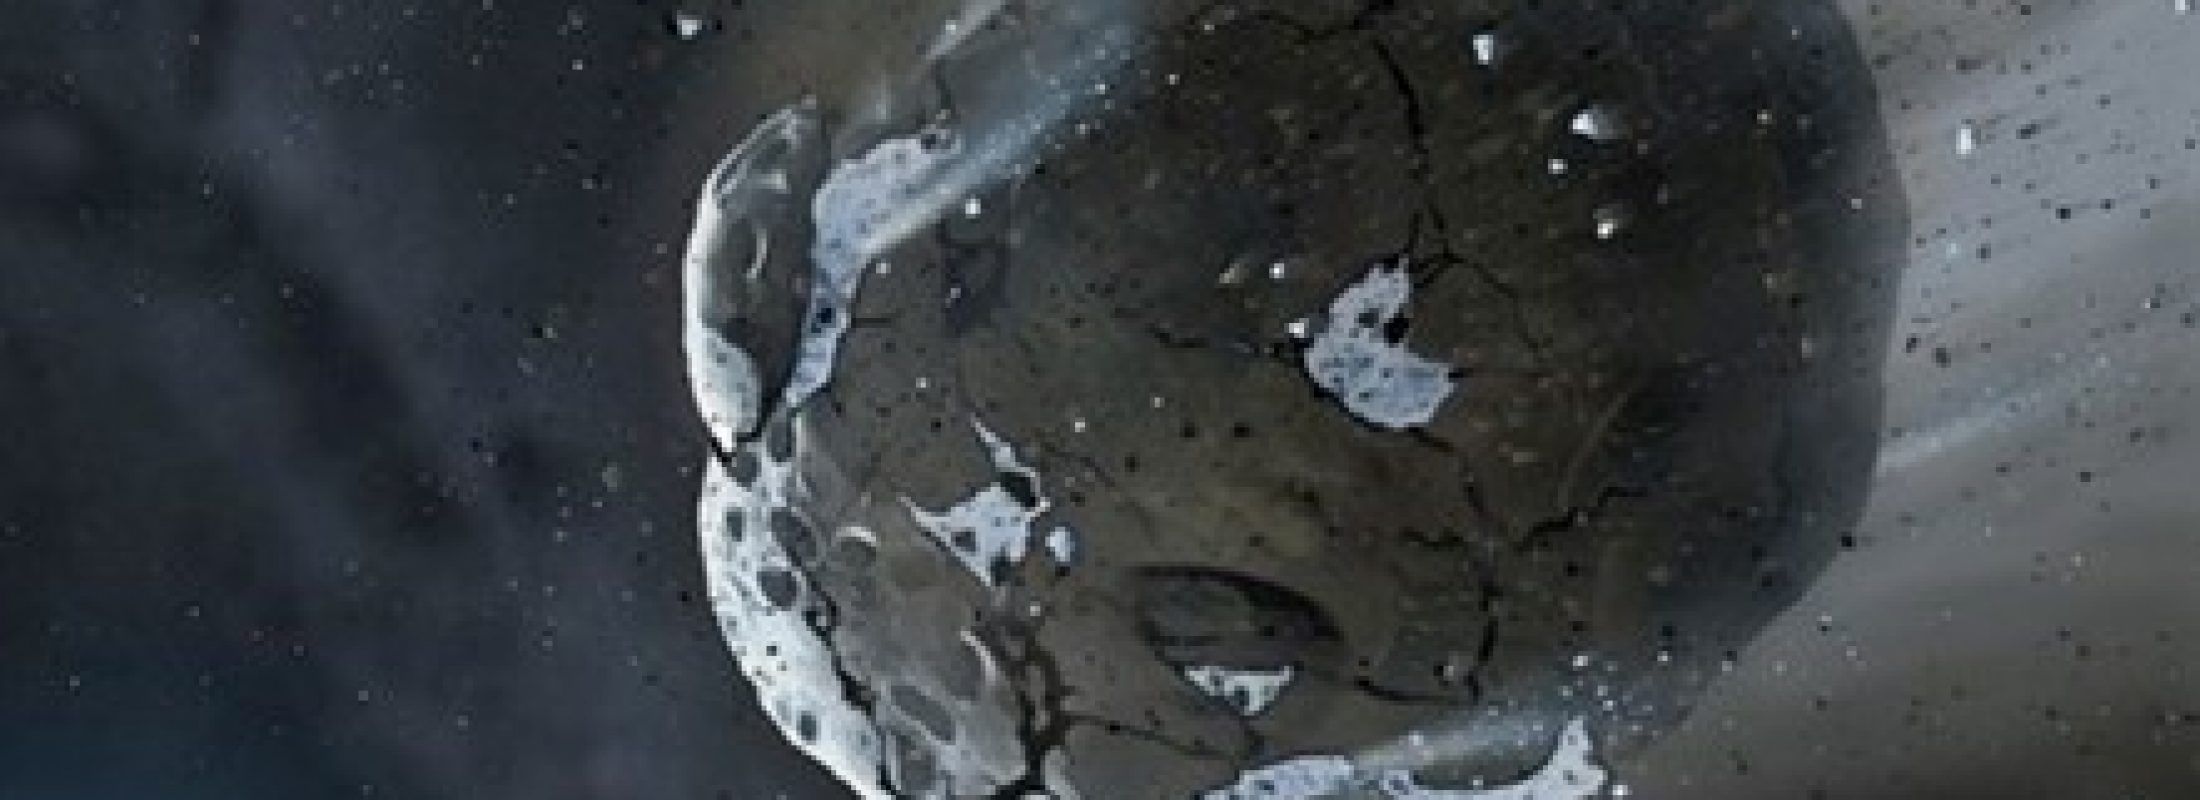 NASA uyardı! Başımıza taş yağabilir